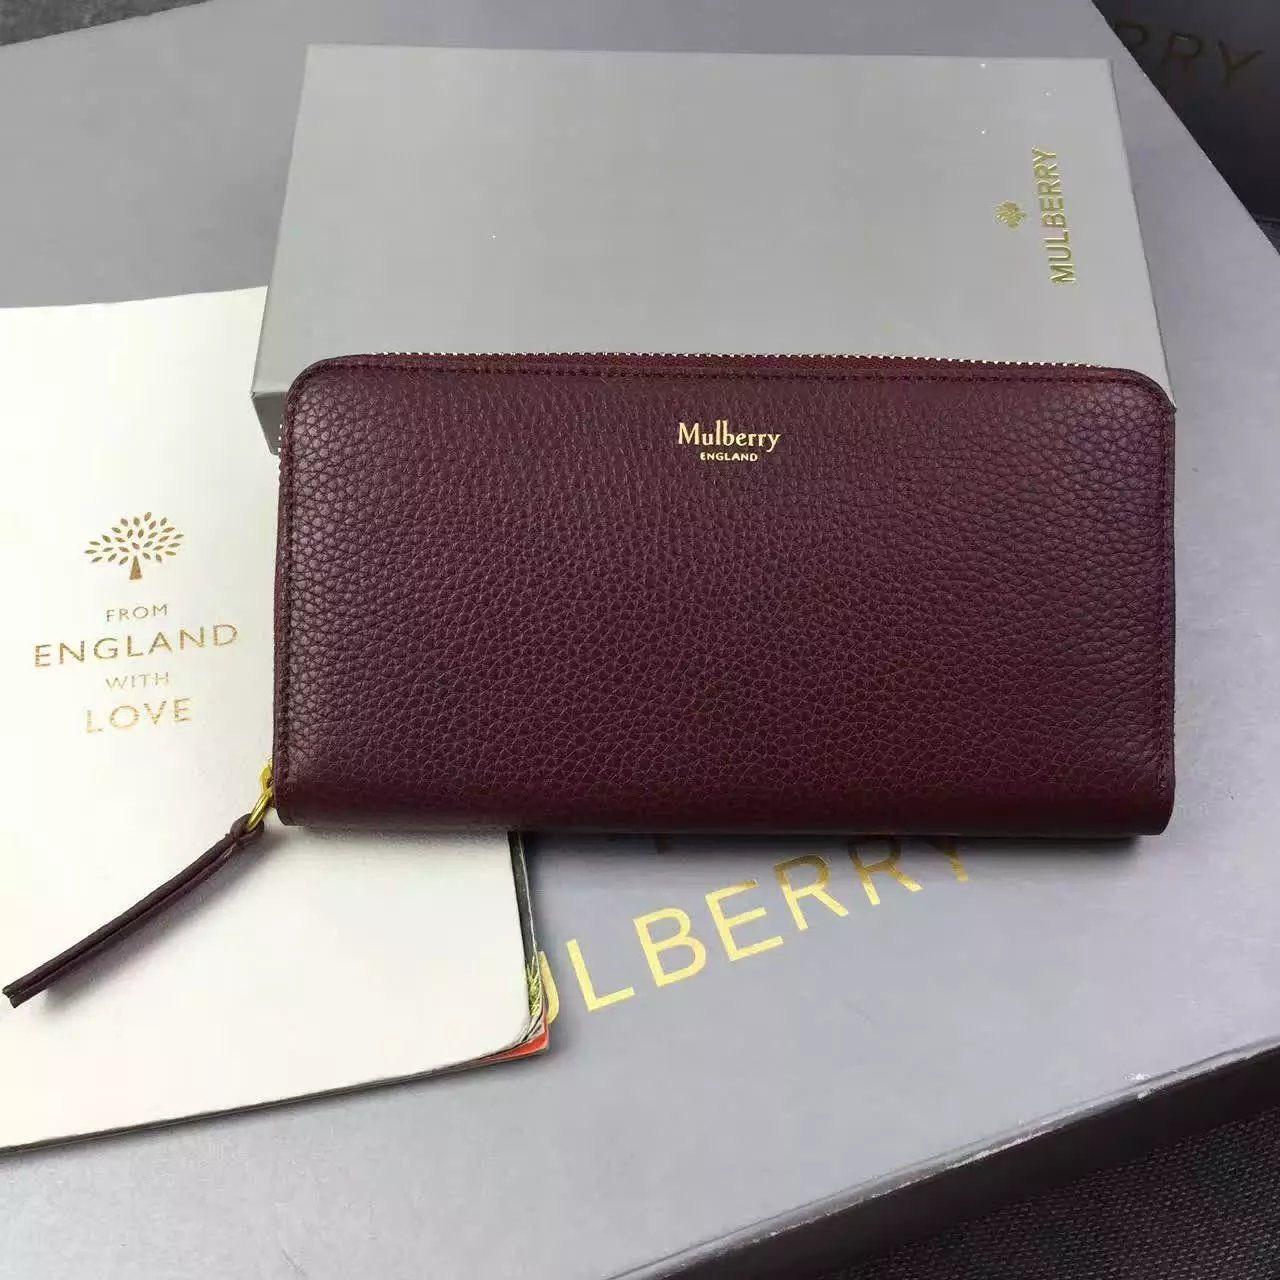 892609b2ed59 2016 Mulberry 8 CC Zip Around Wallet Burgundy Small Classic Grain ...